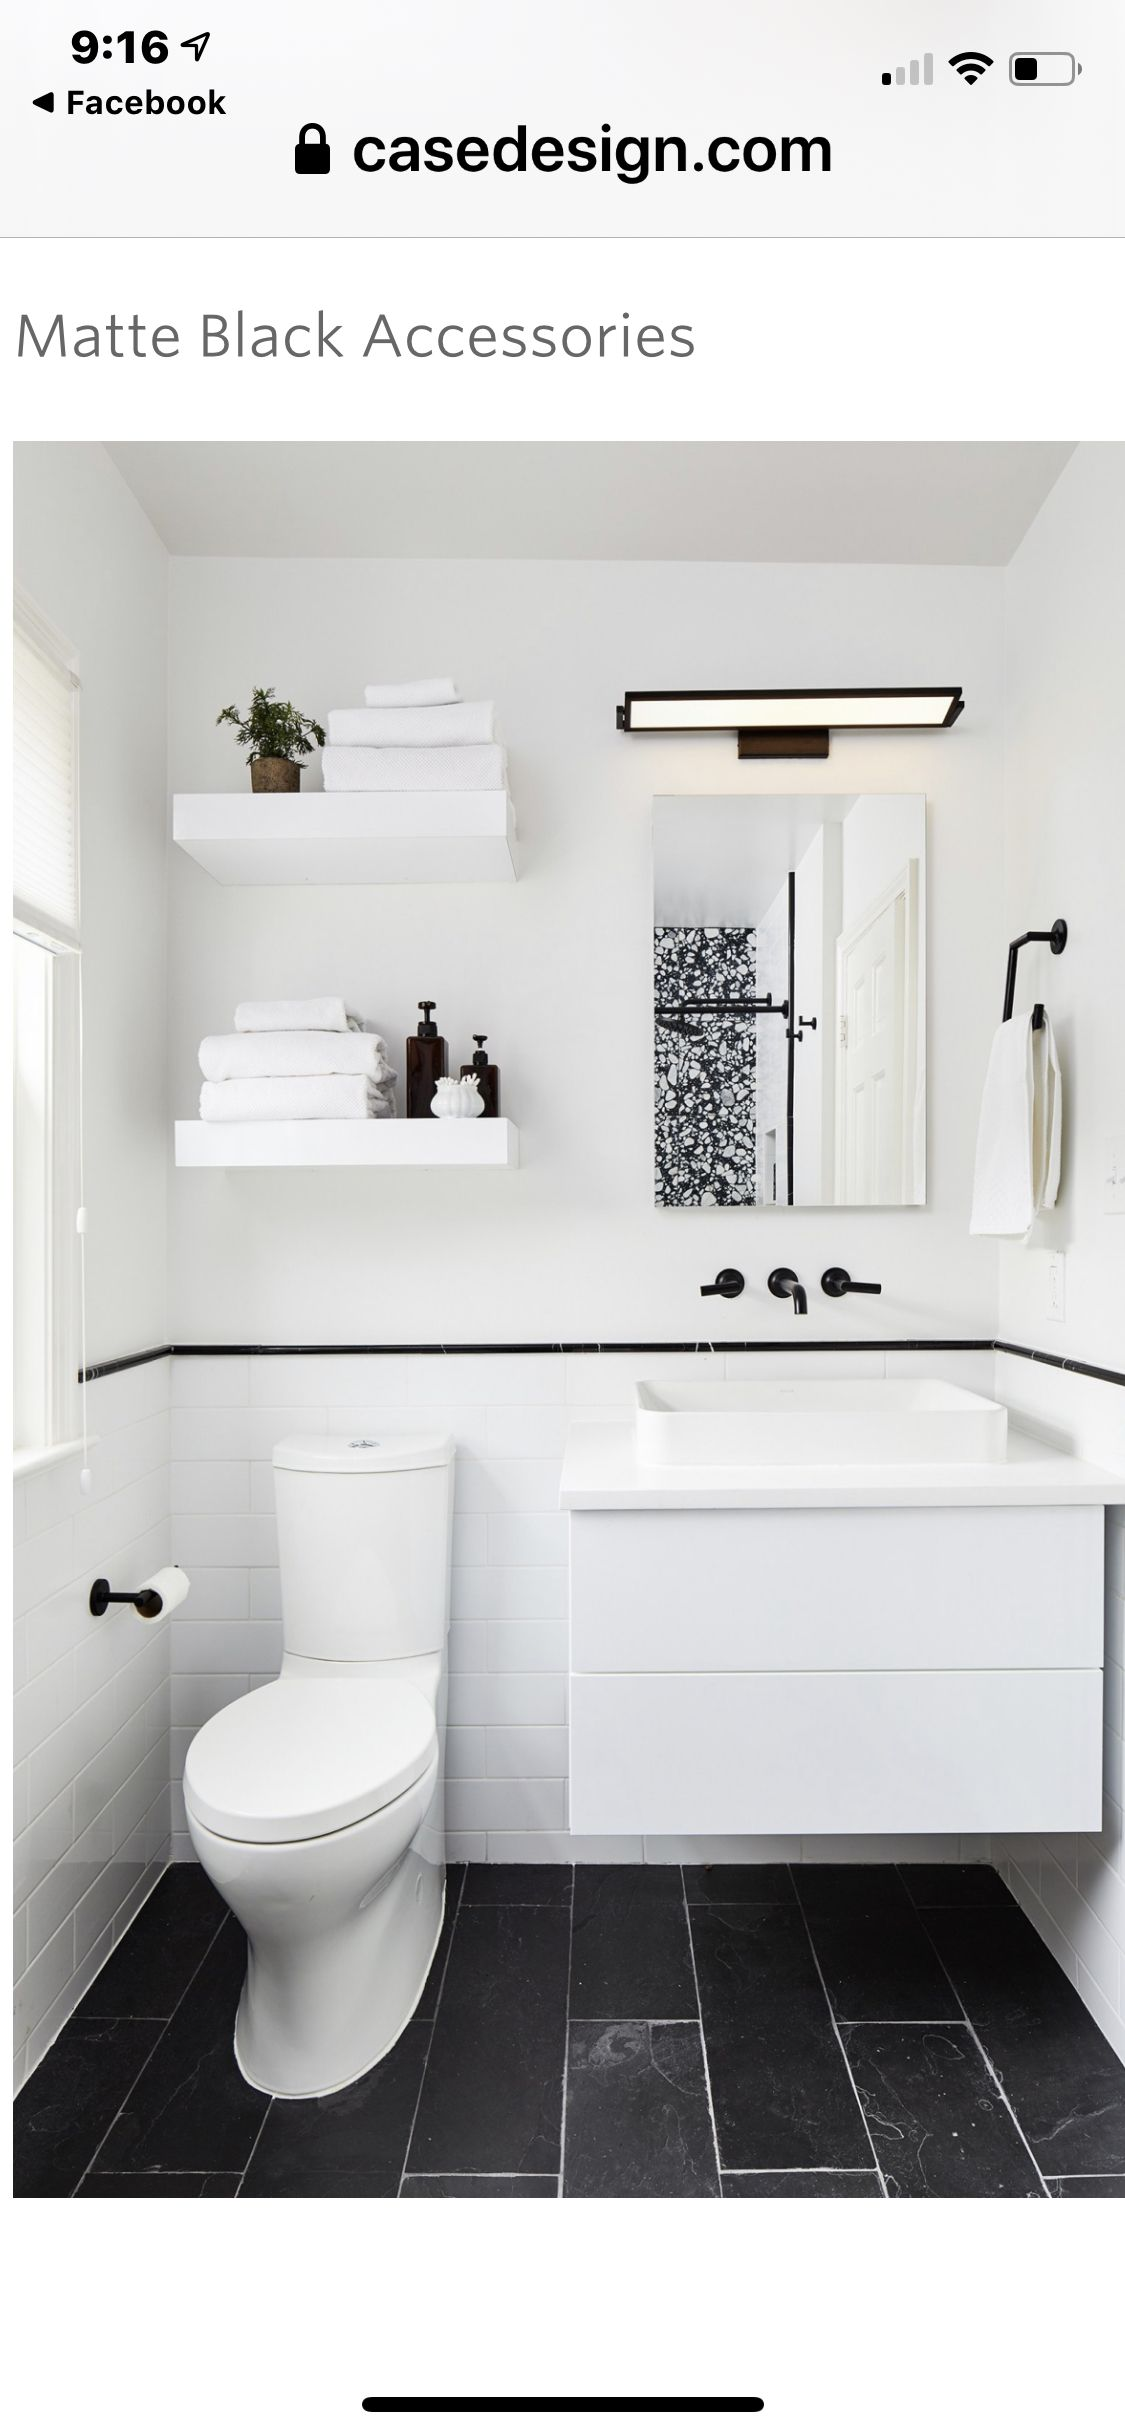 Pin By Sylvia Midgett On Bath In 2020 Bathroom Lighting Design White Room Decor Bathroom Interior Design